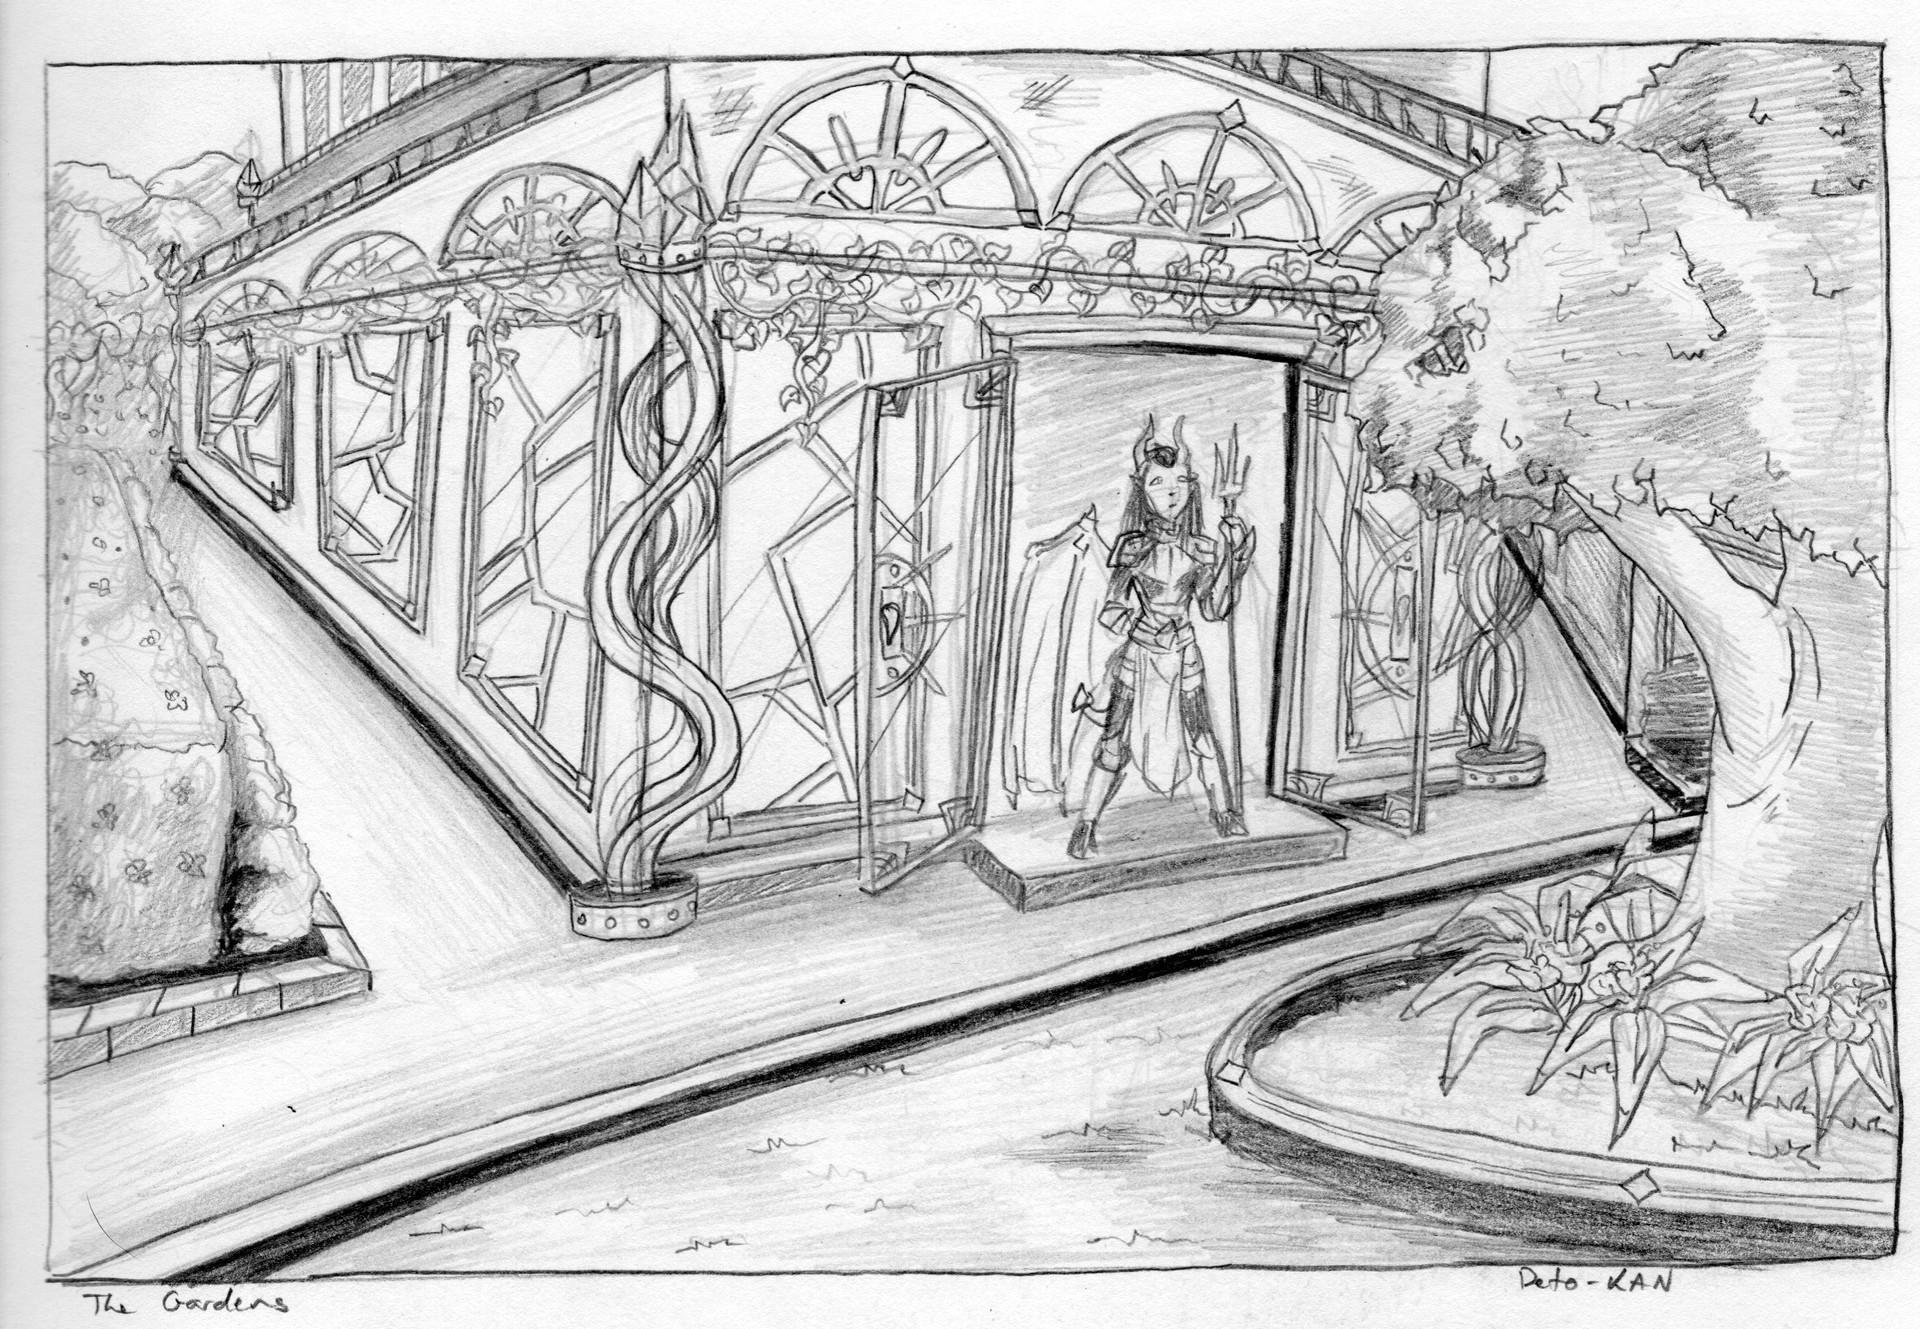 Detonya kan the gardens sketch